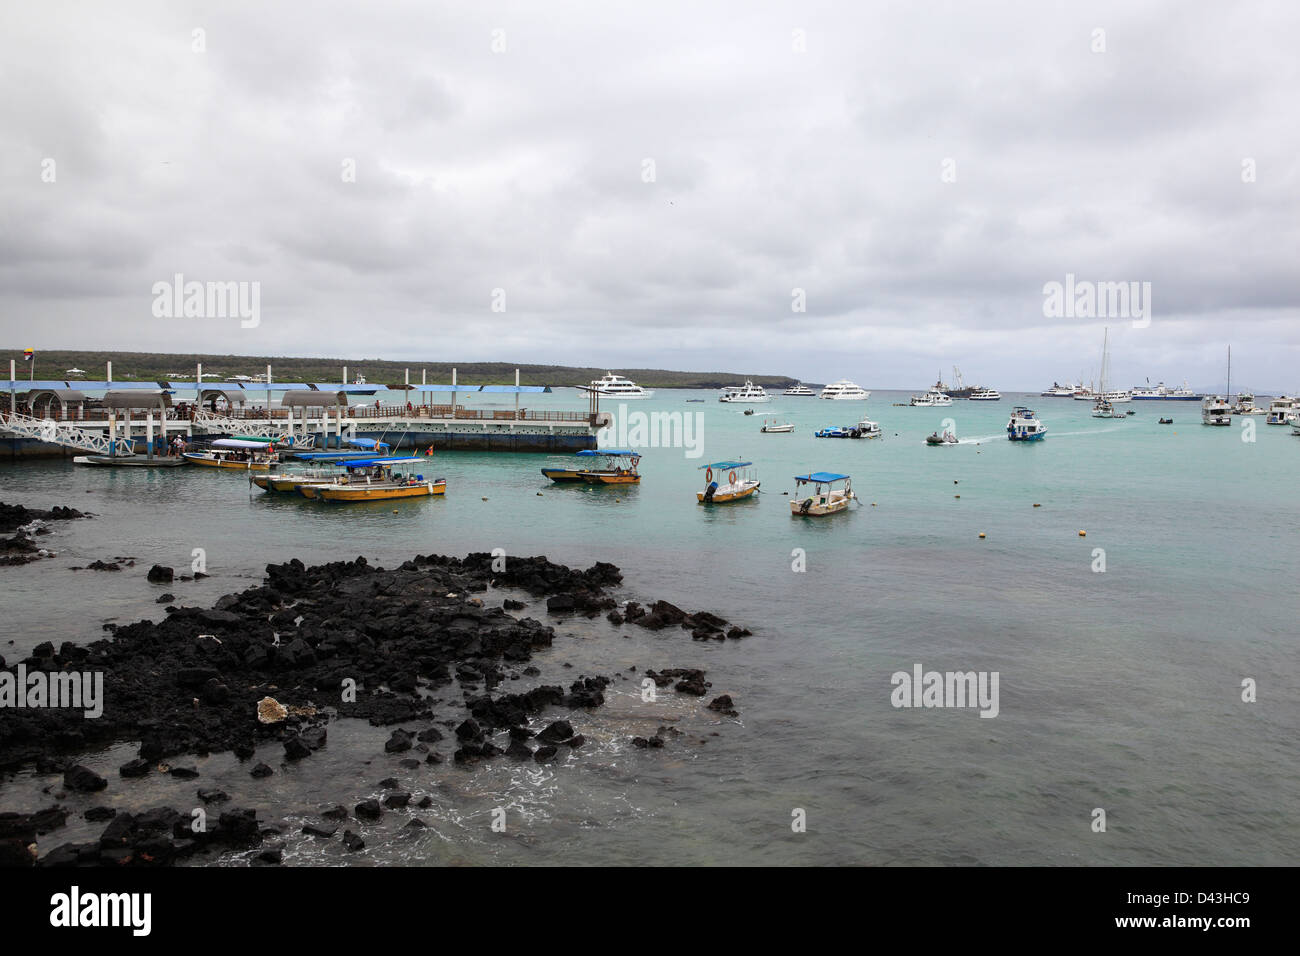 Harbor at Galapagos Islands, Ecuador - Stock Image